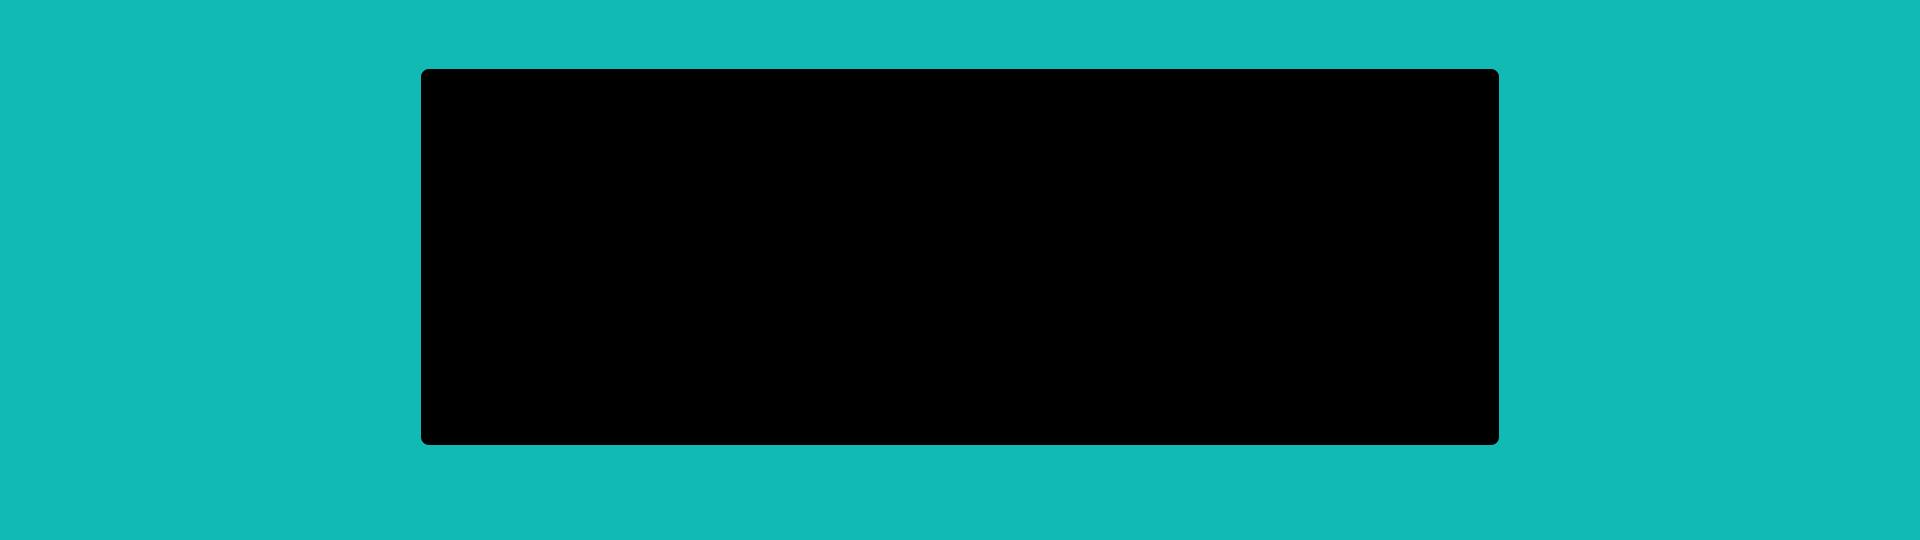 CATEGORY-MBLYA-KISINDIRIMIENTRENDMOBILYALARDANET30INDIRIM-23-02